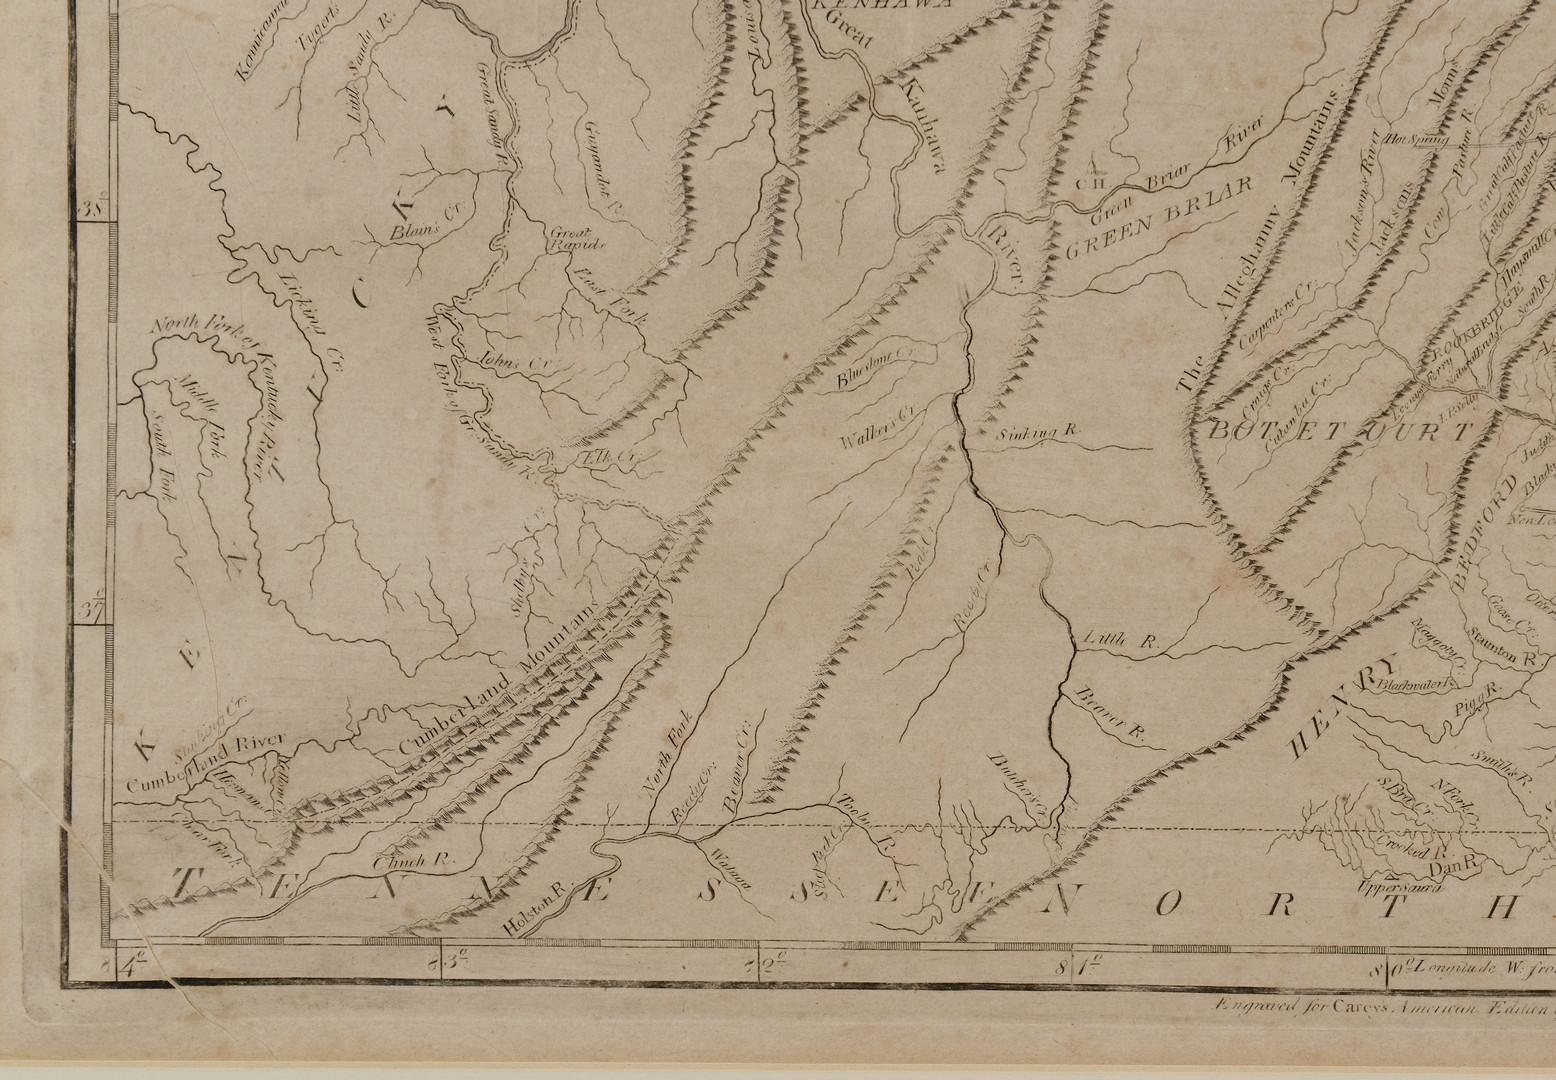 Lot 402: 1809 Map of Virginia, Samuel Lewis